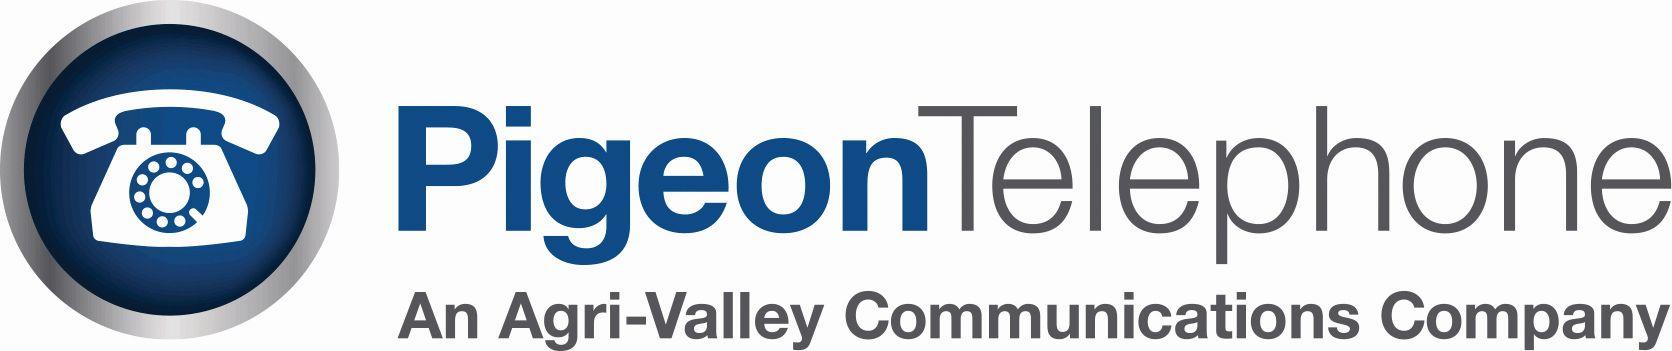 PigeonTelephone Logo 2017.jpg